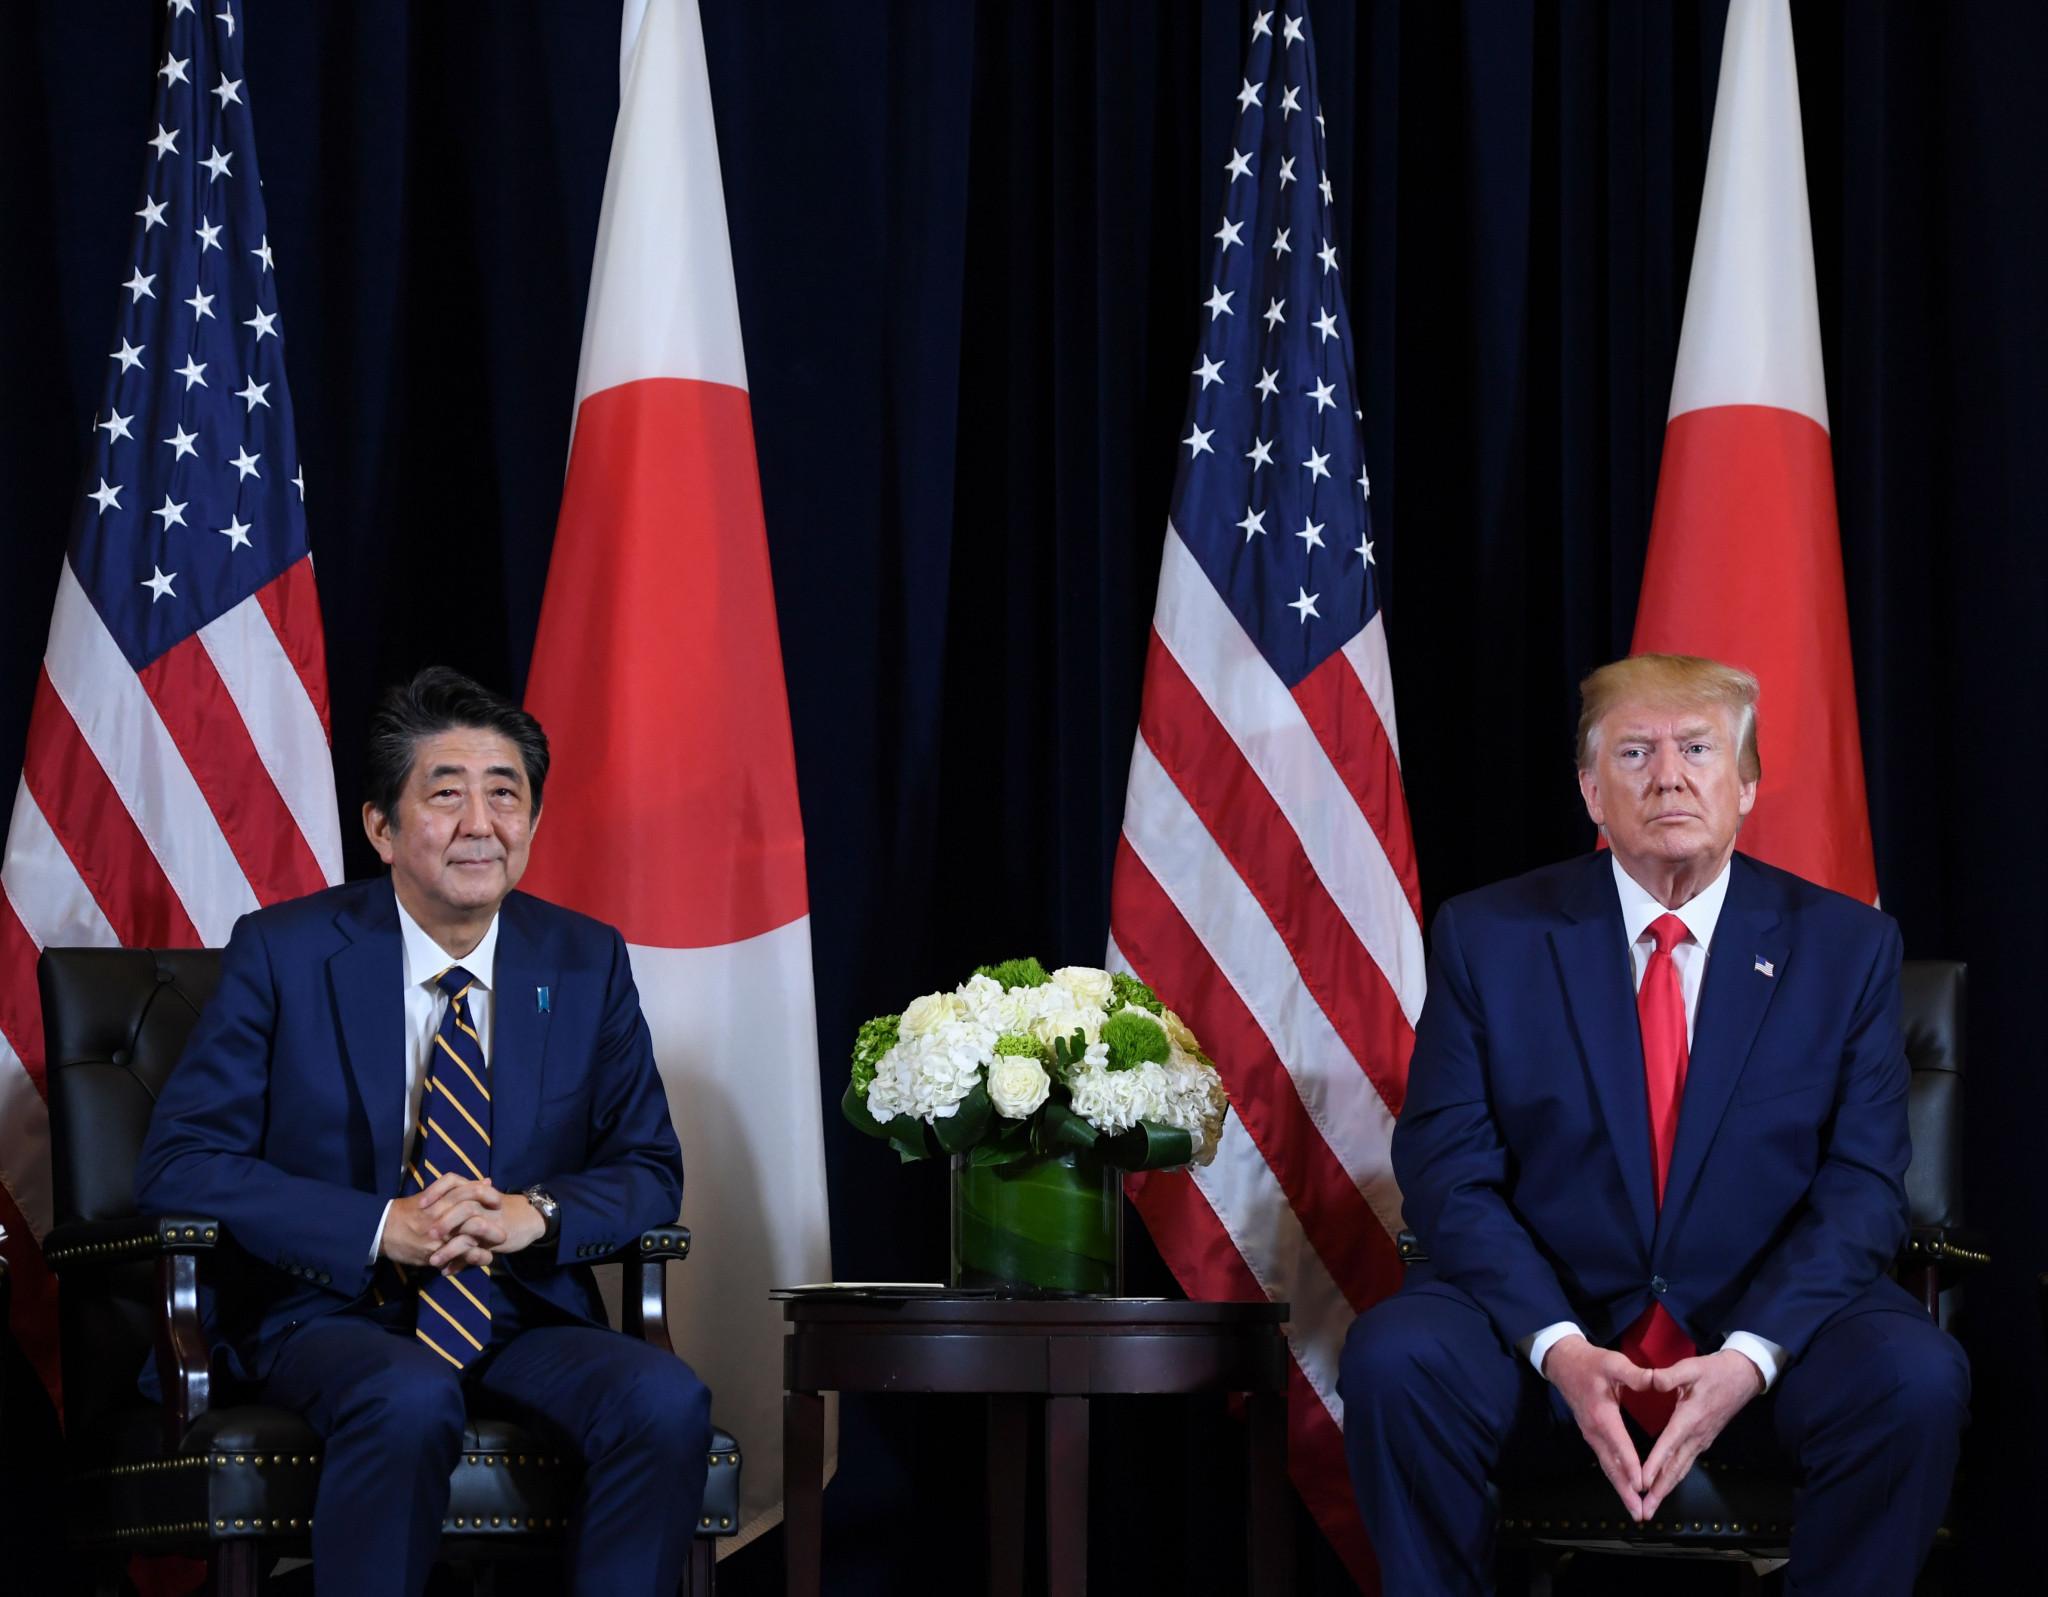 Abe tells Trump Japan preparing for Tokyo 2020 as planned after US President suggests postponement